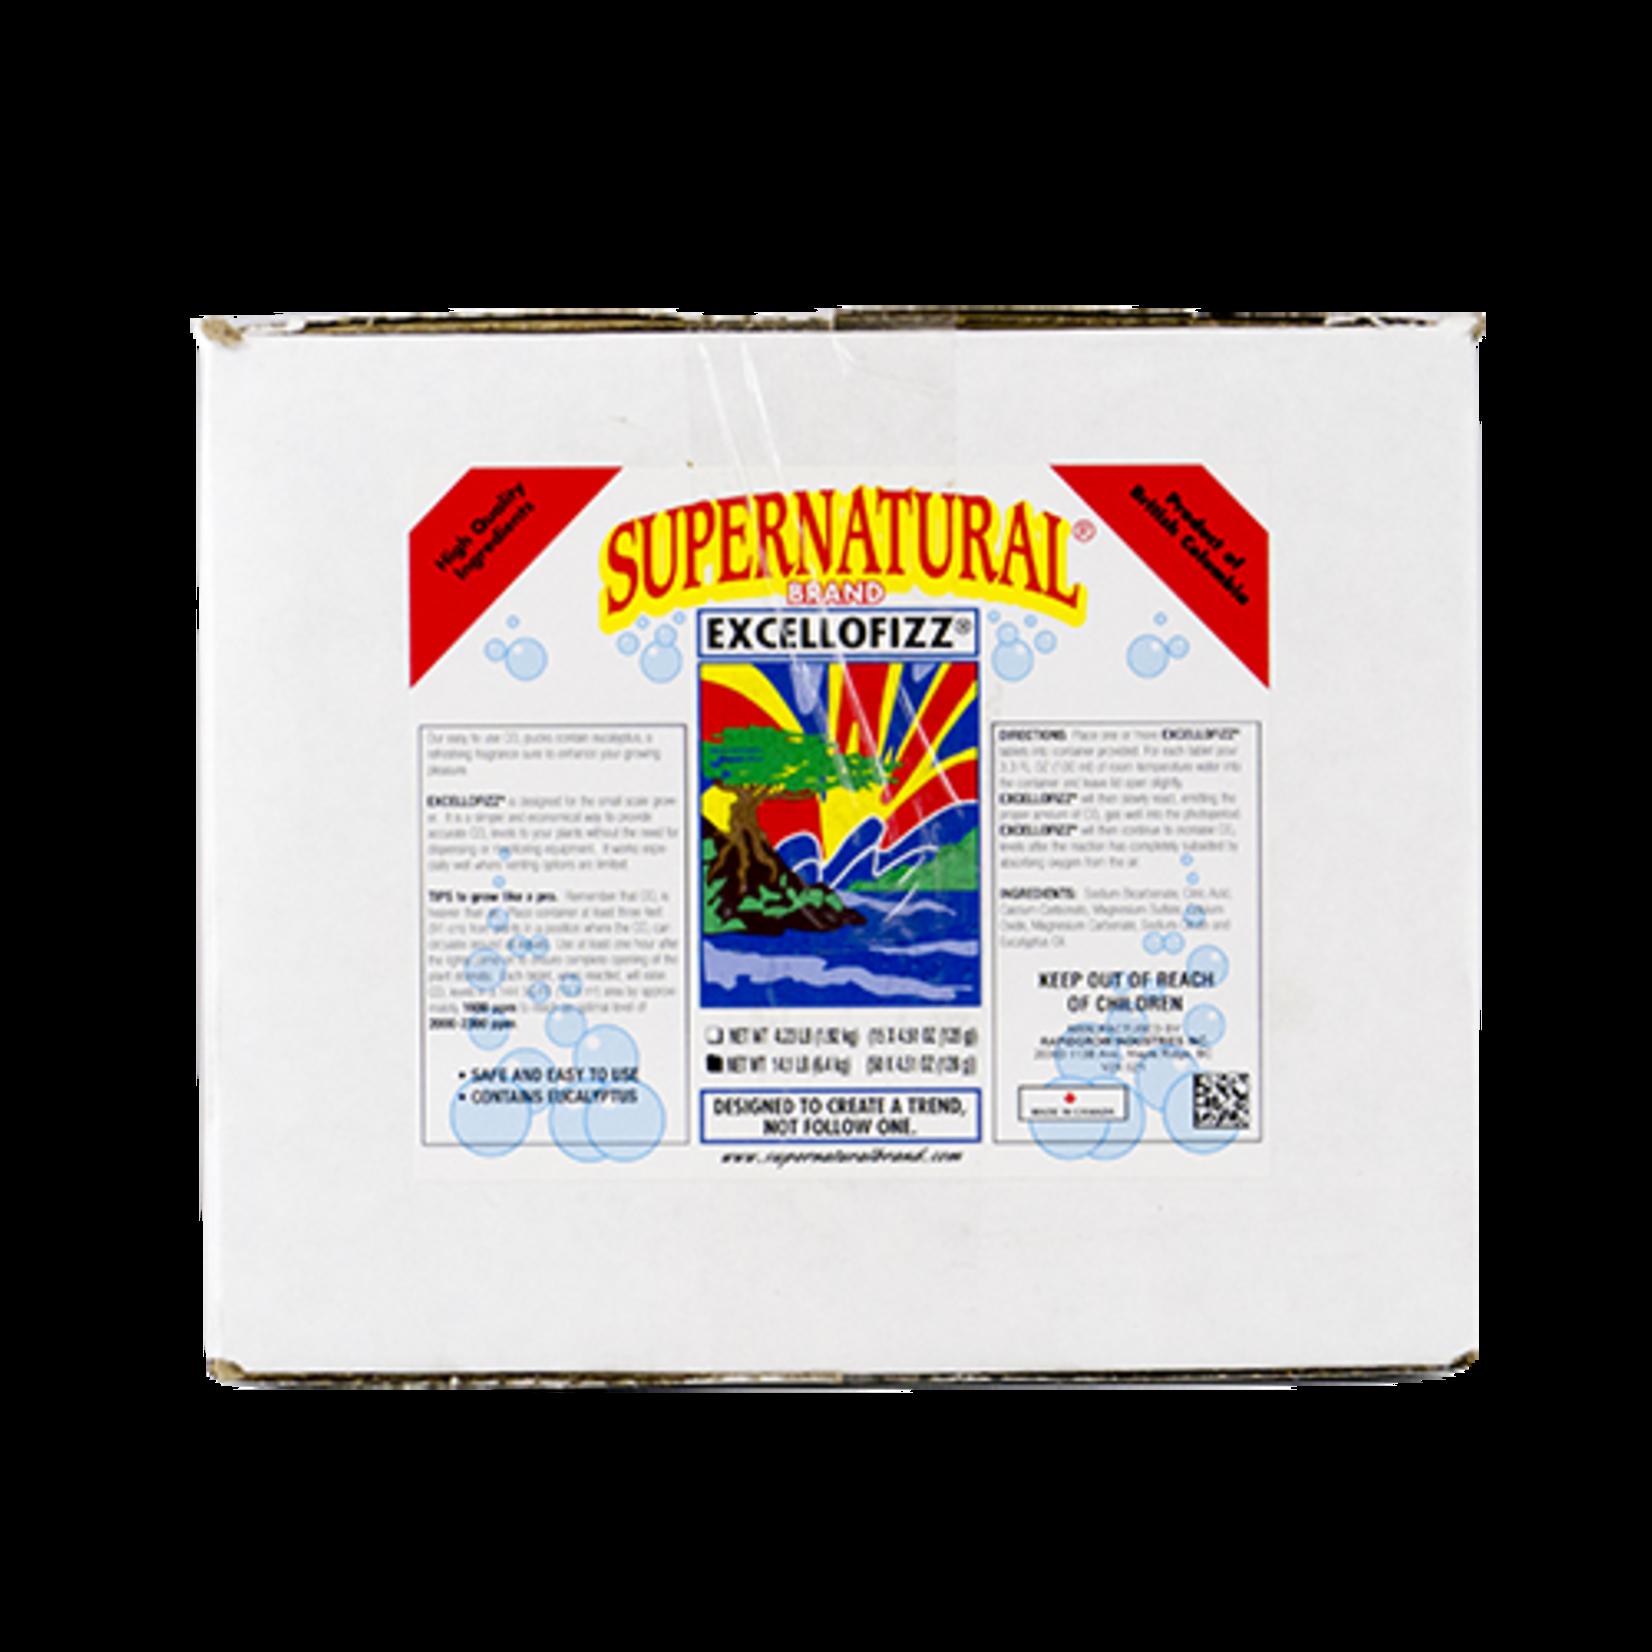 supernatural Super Natural excell o fizz